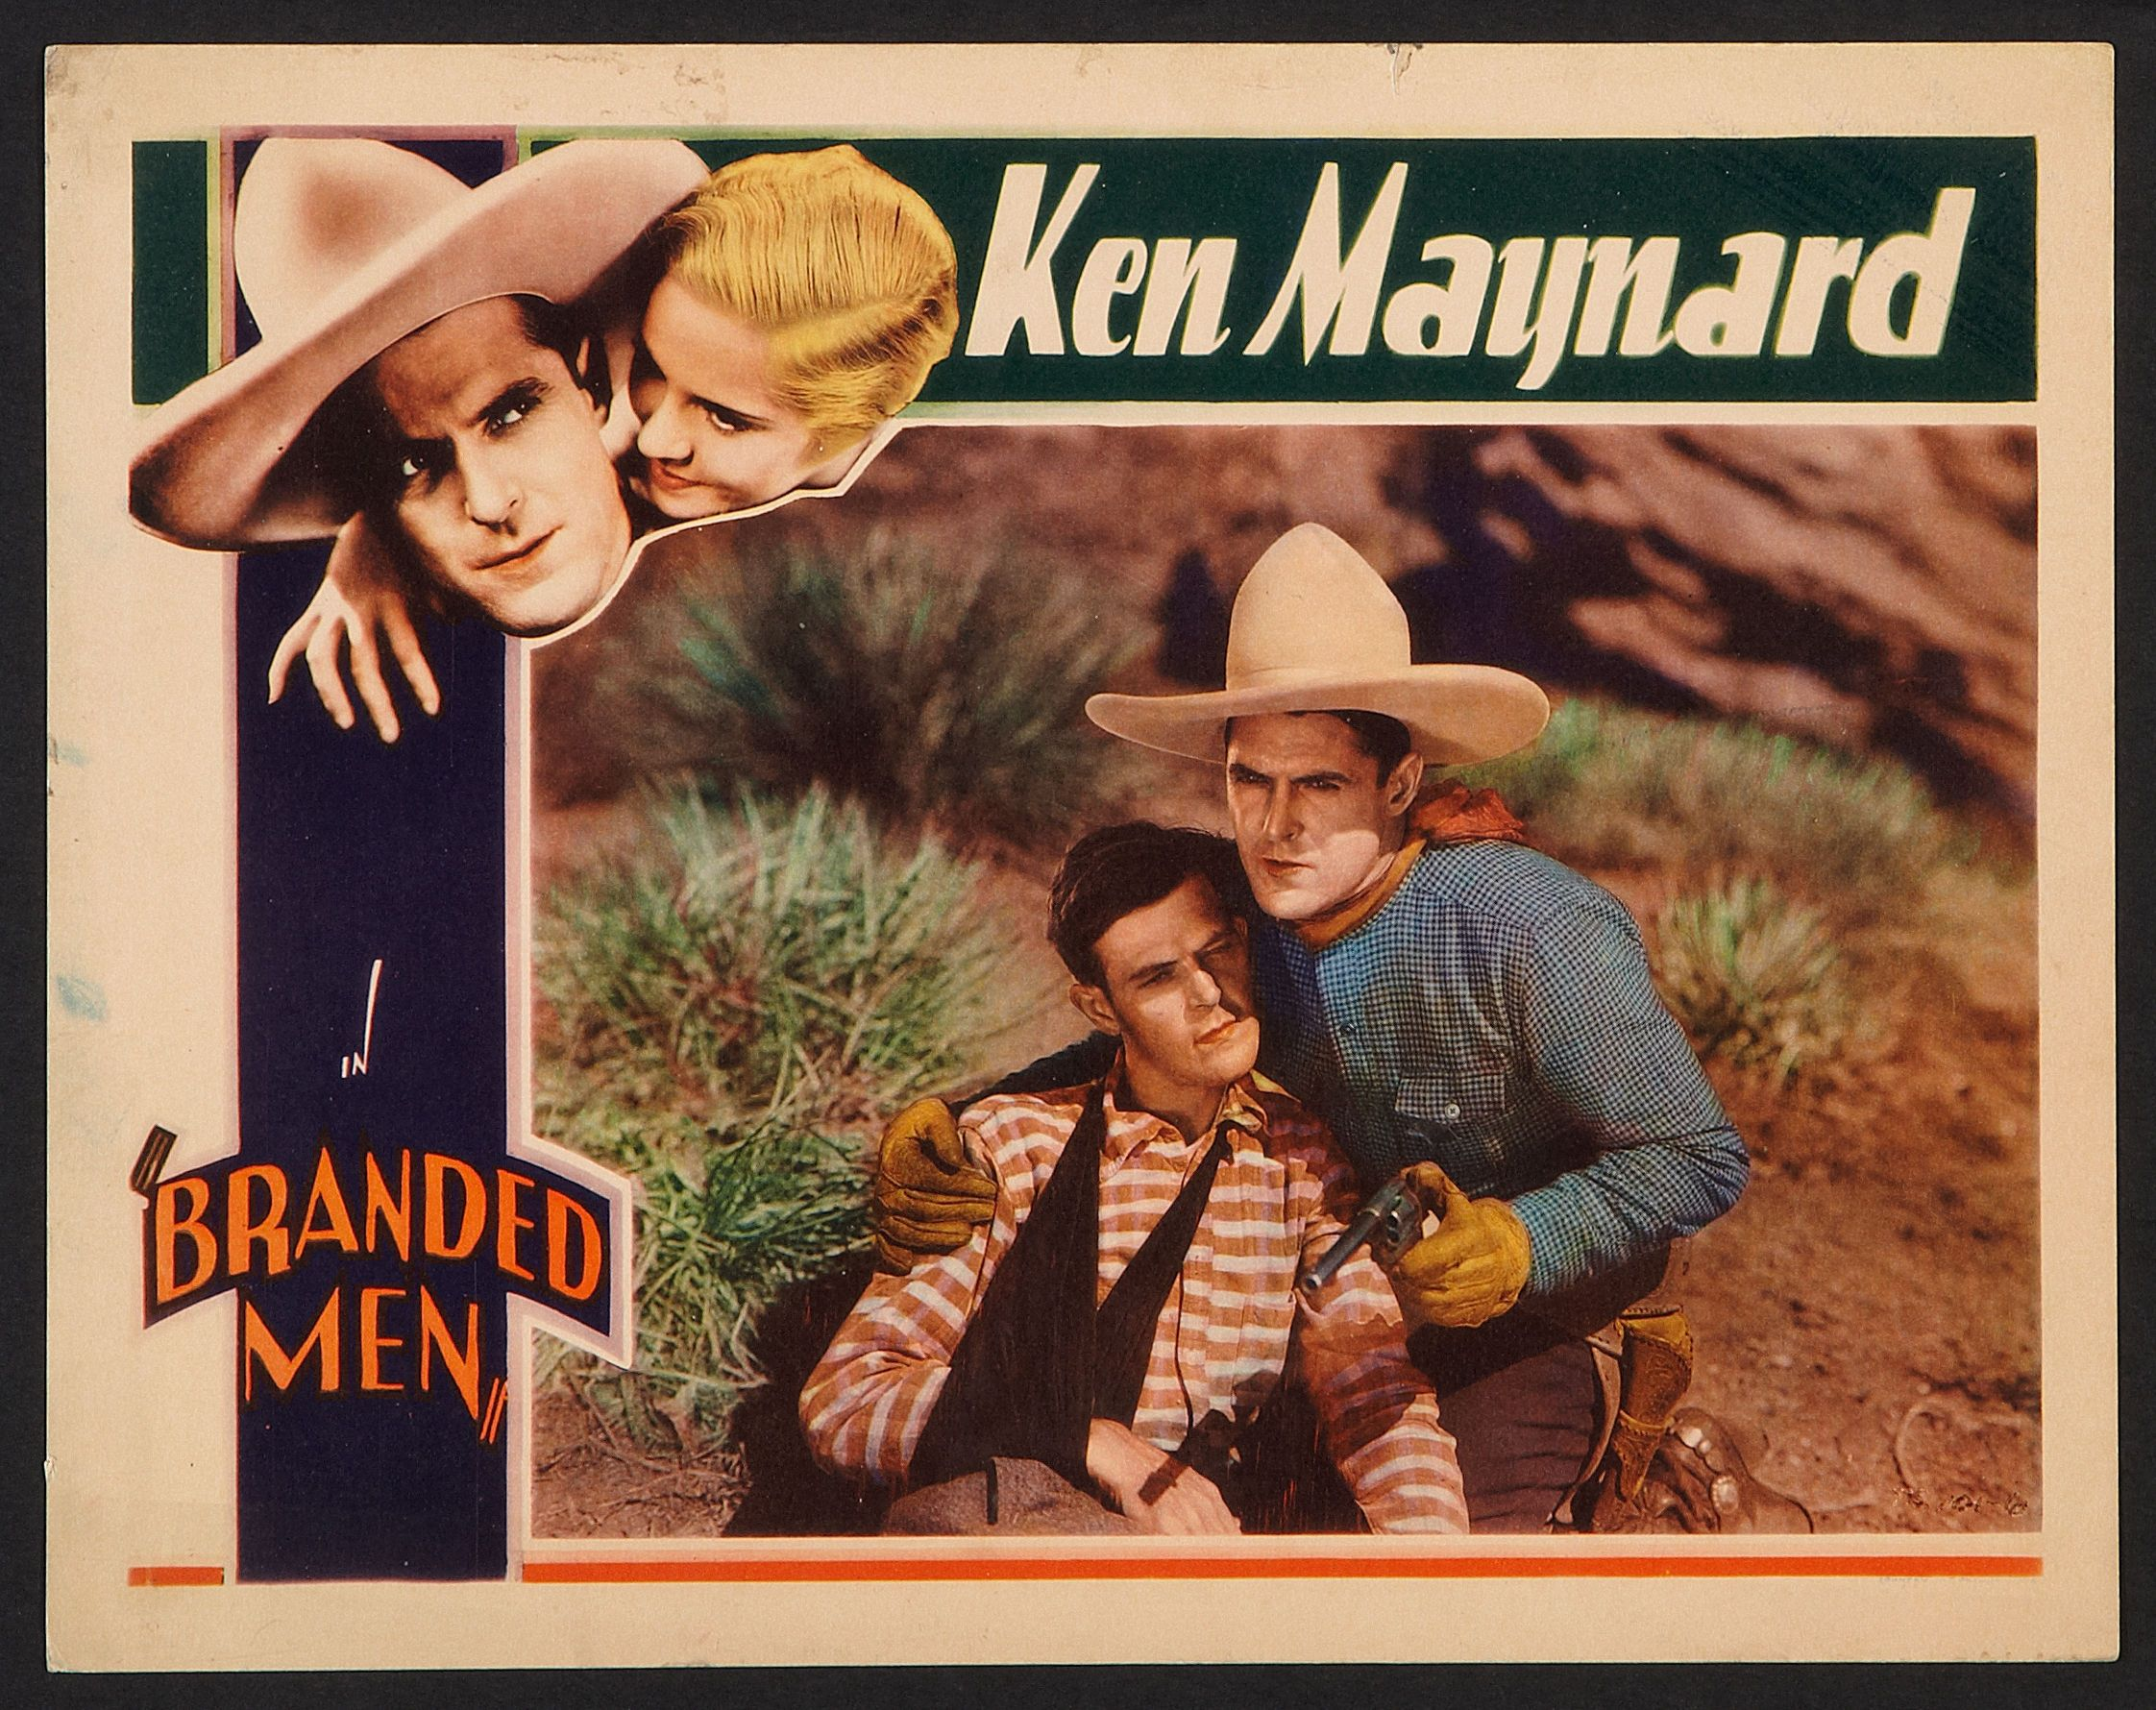 June Clyde, Donald Keith, and Ken Maynard in Branded Men (1931)